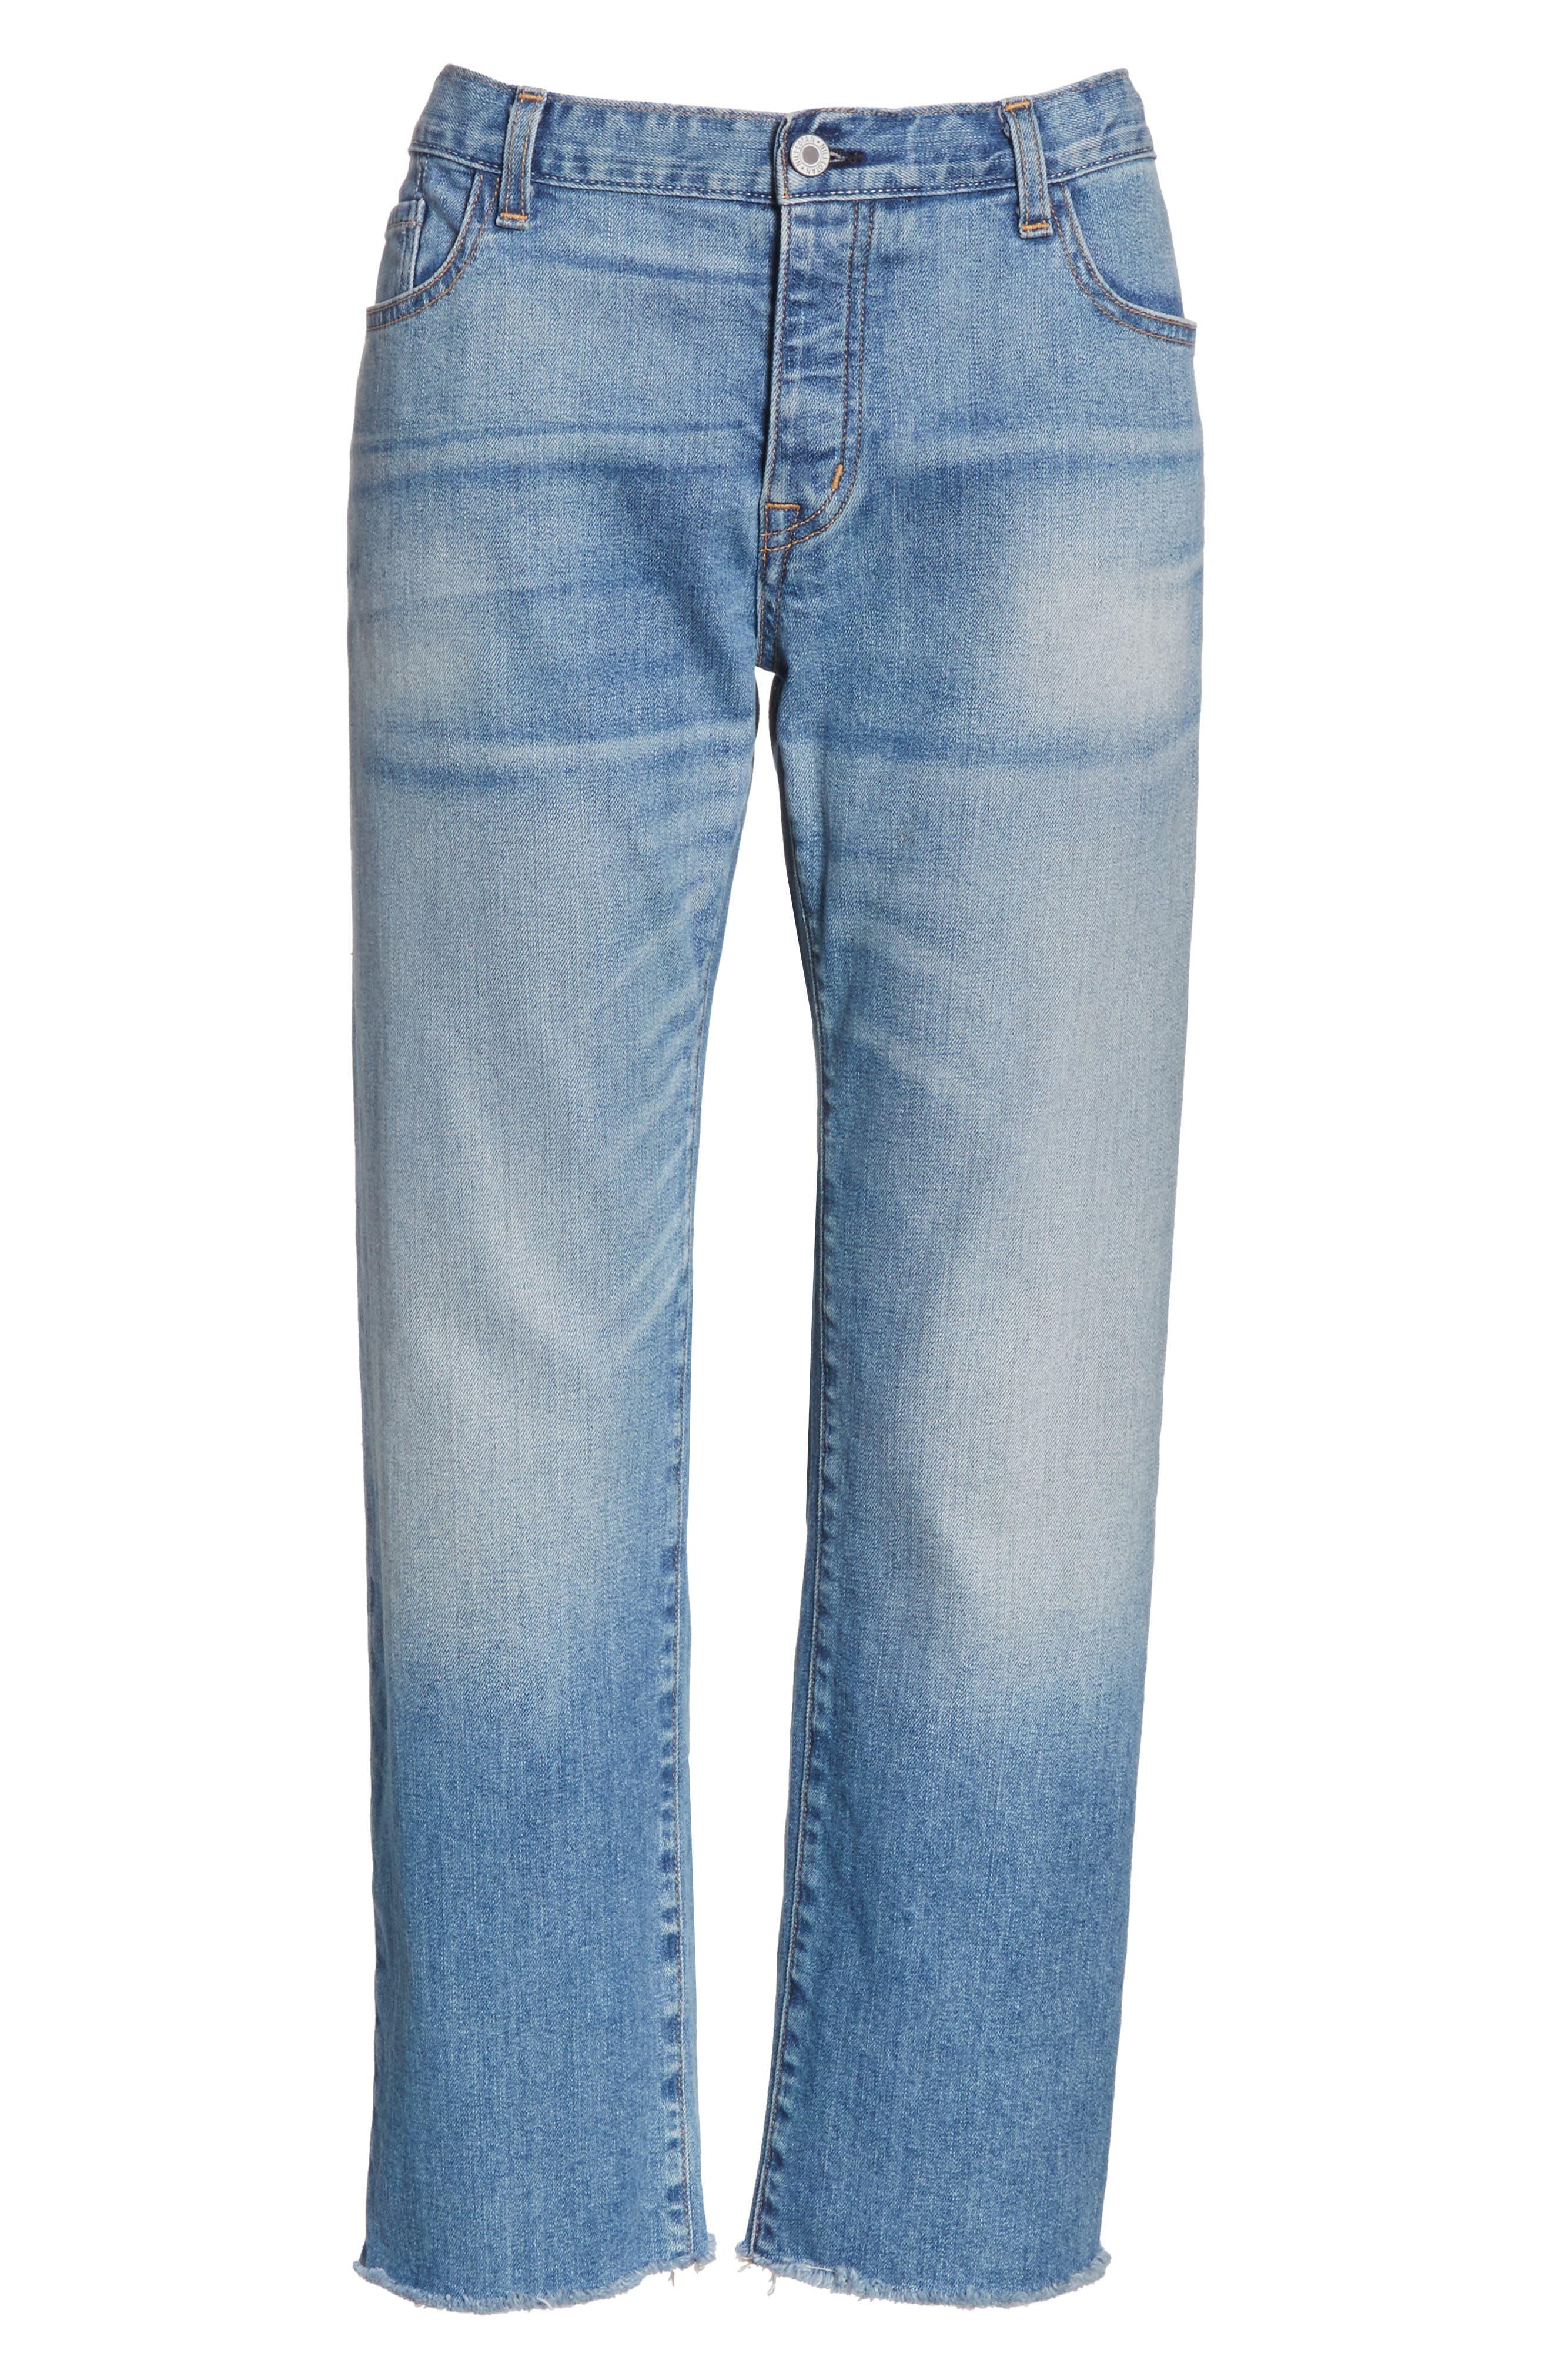 NILI LOTAN,                             Raw Edge Crop Boyfriend Jeans,                             Alternate thumbnail 6, color,                             VENICE WASH